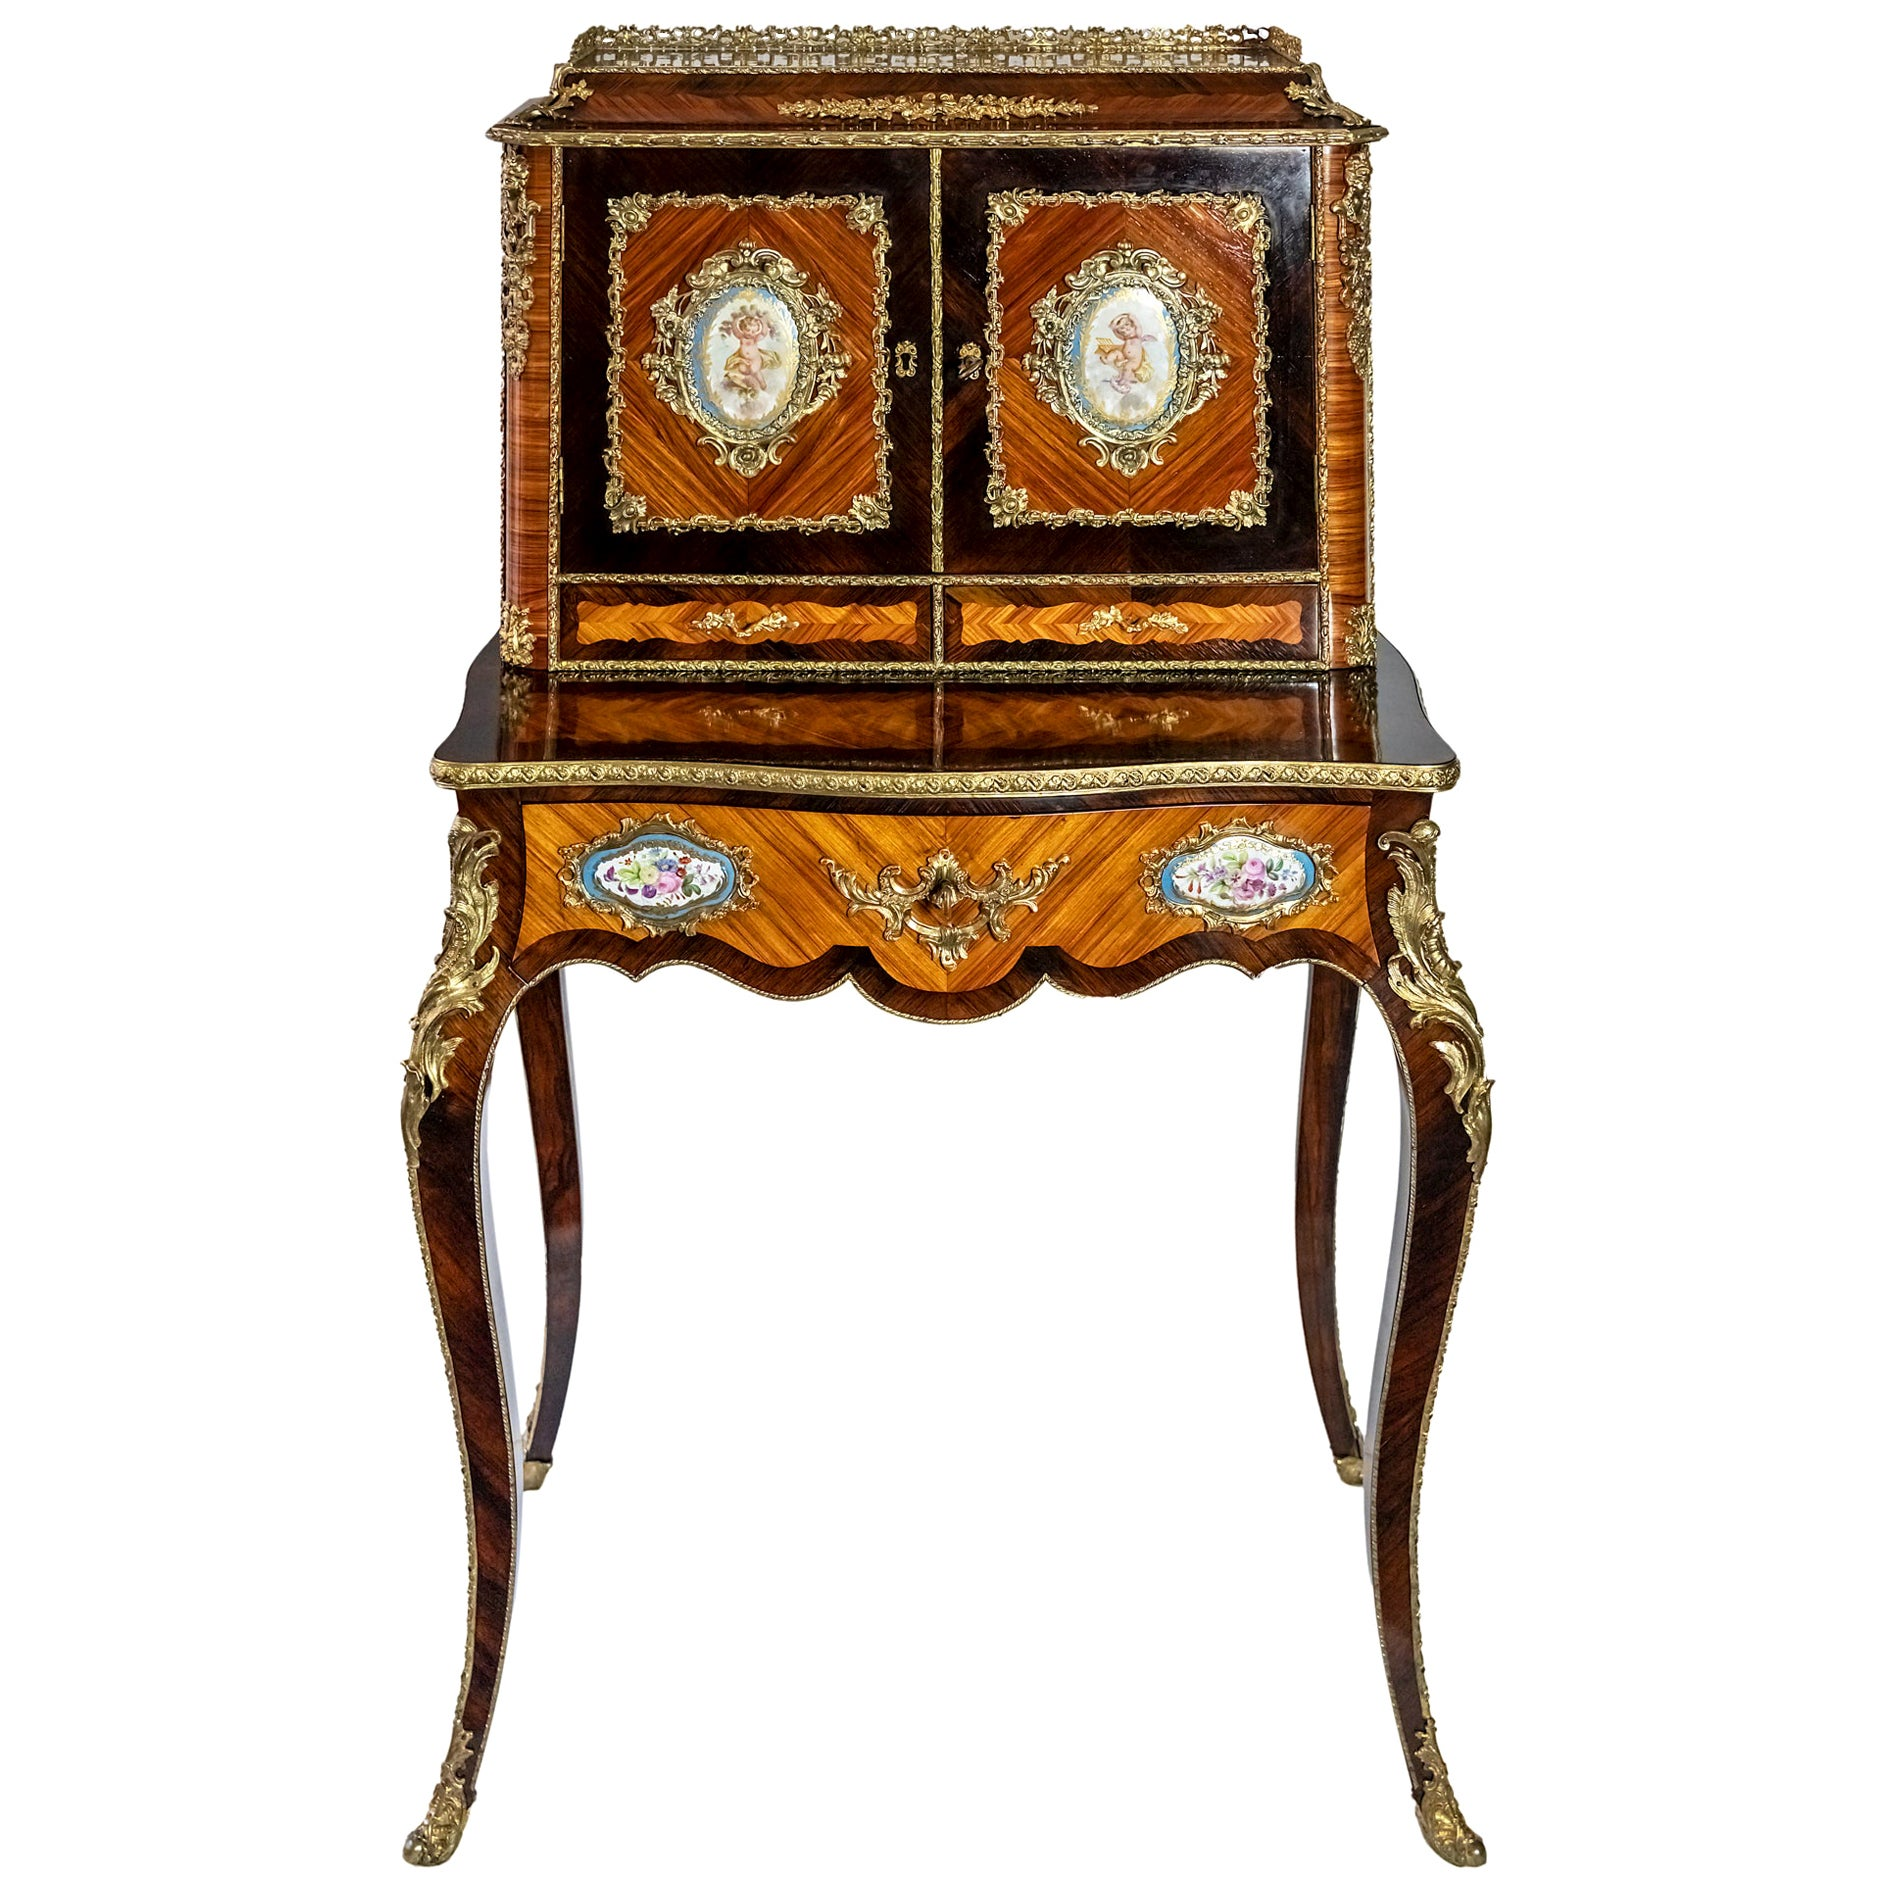 napoleon iii secretaires 23 for sale at 1stdibs